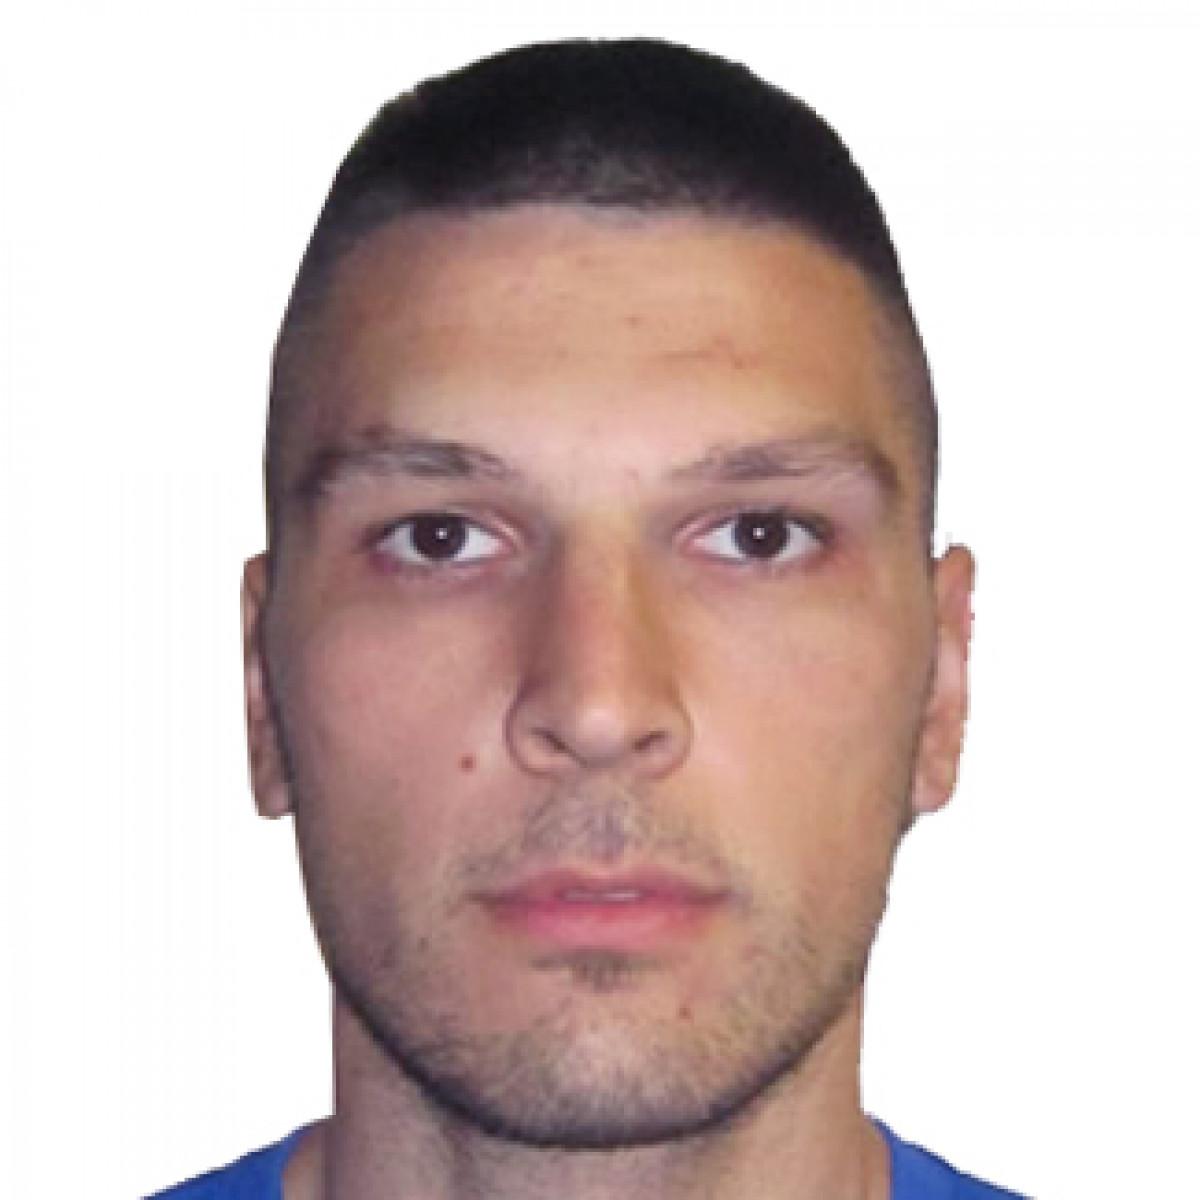 Aleksandar Beloica